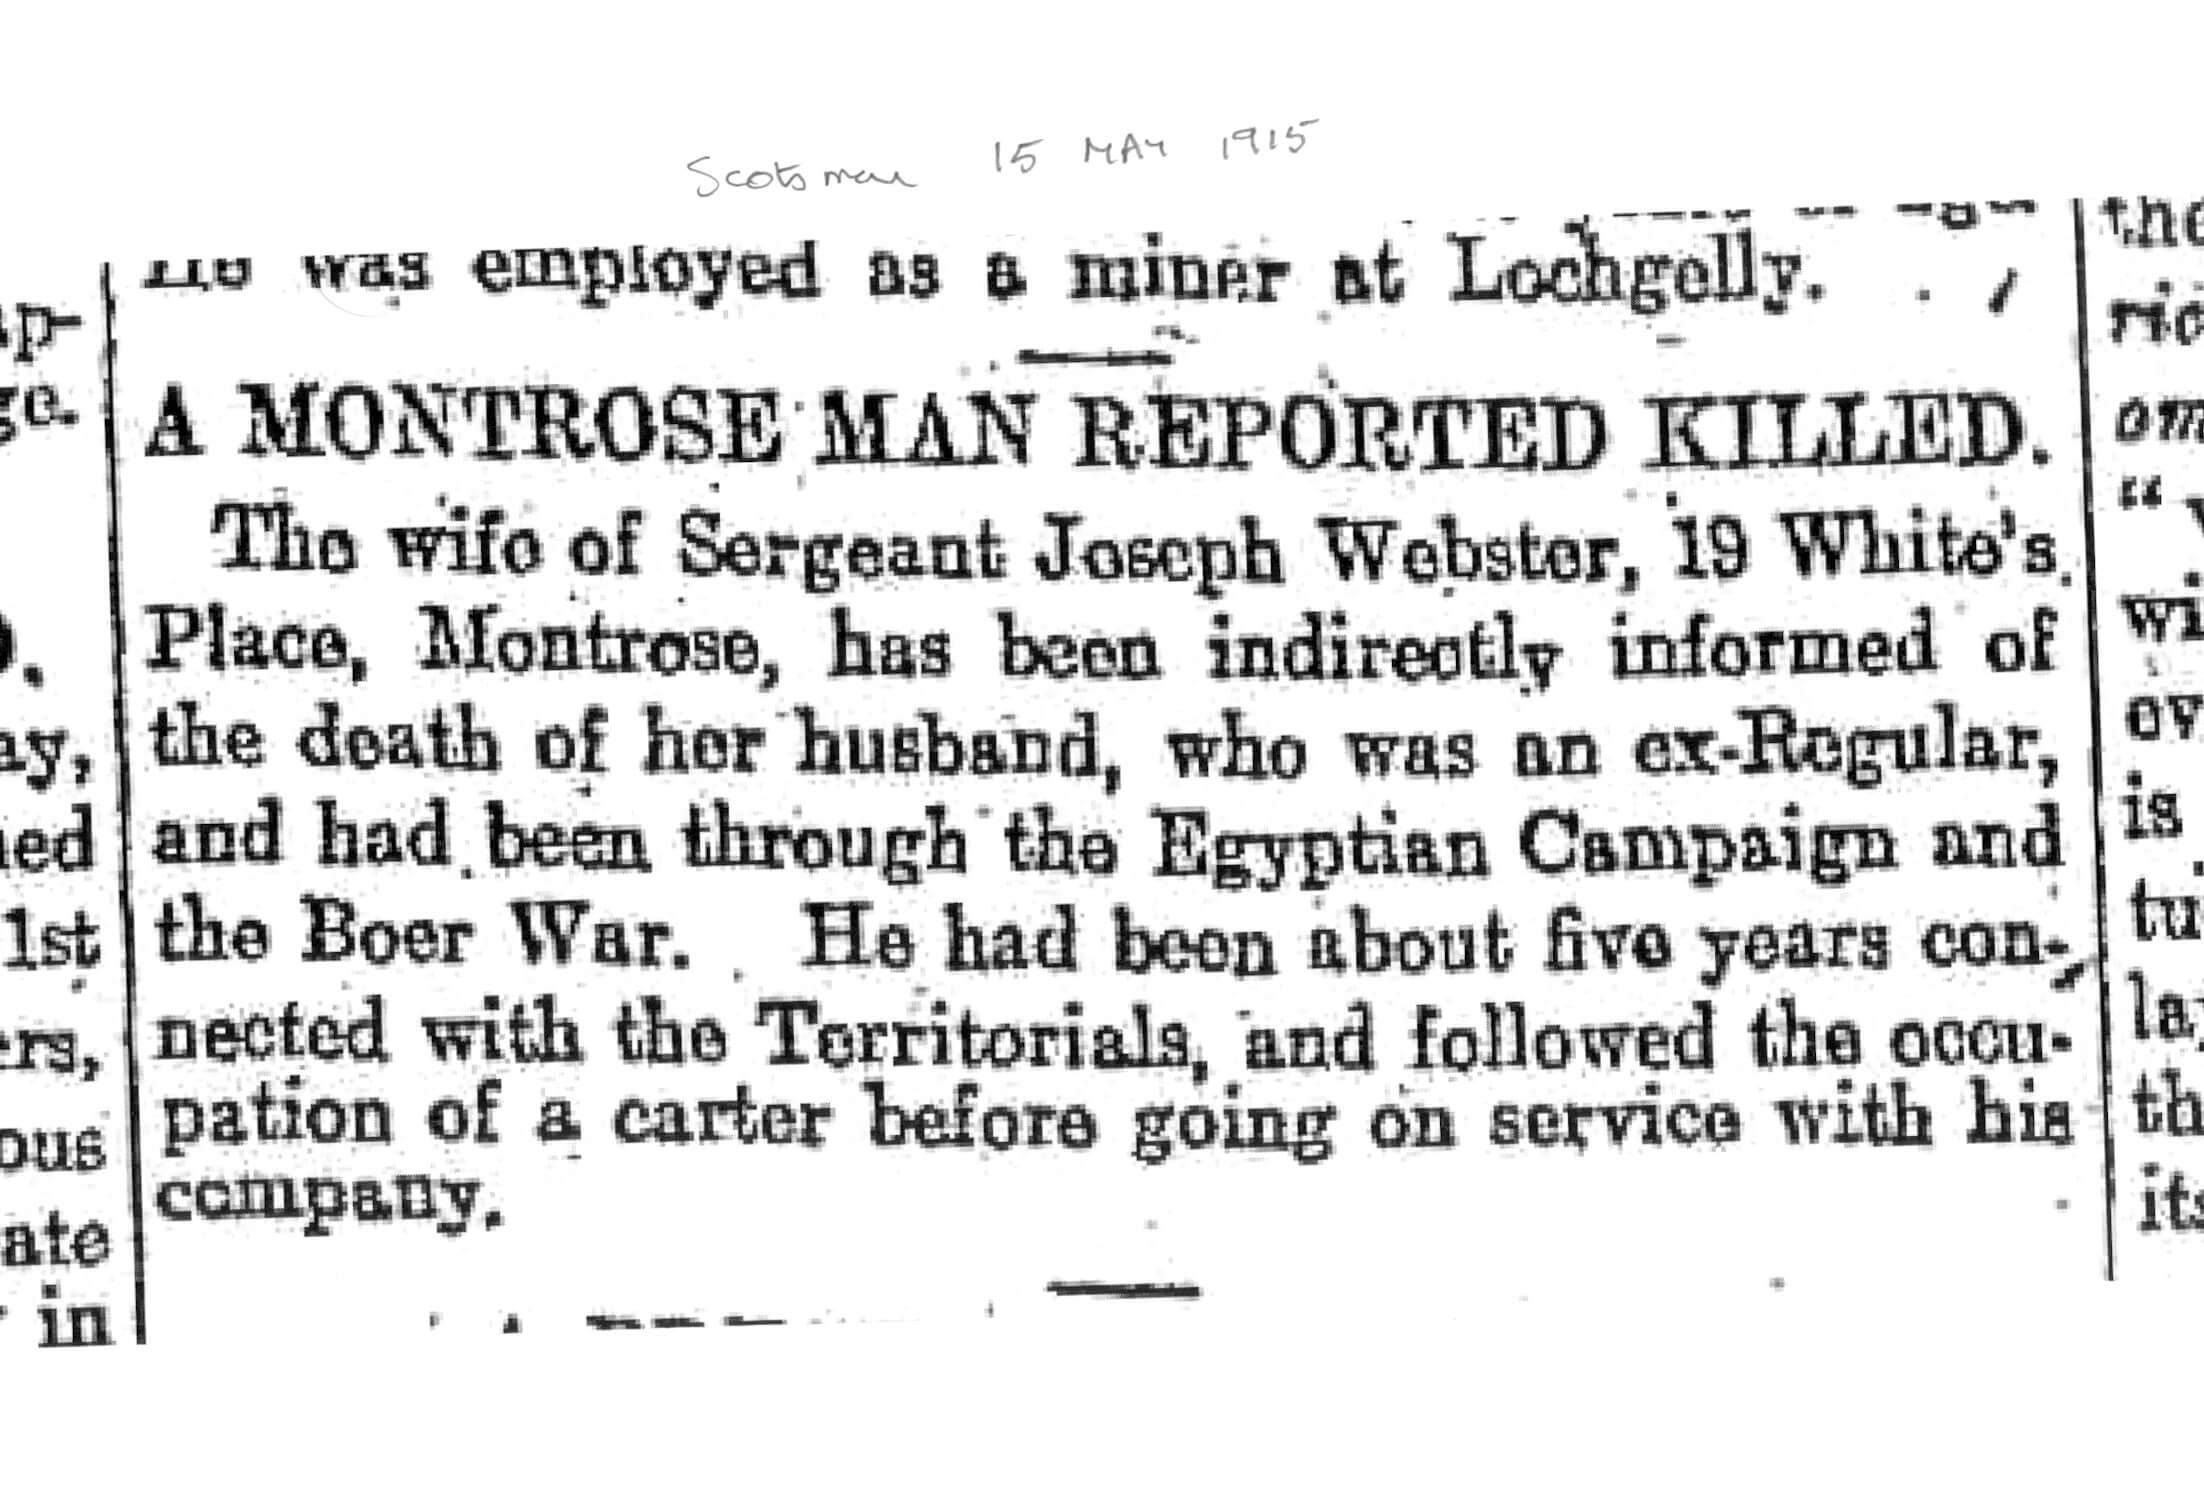 Scotsman 15 May 1915